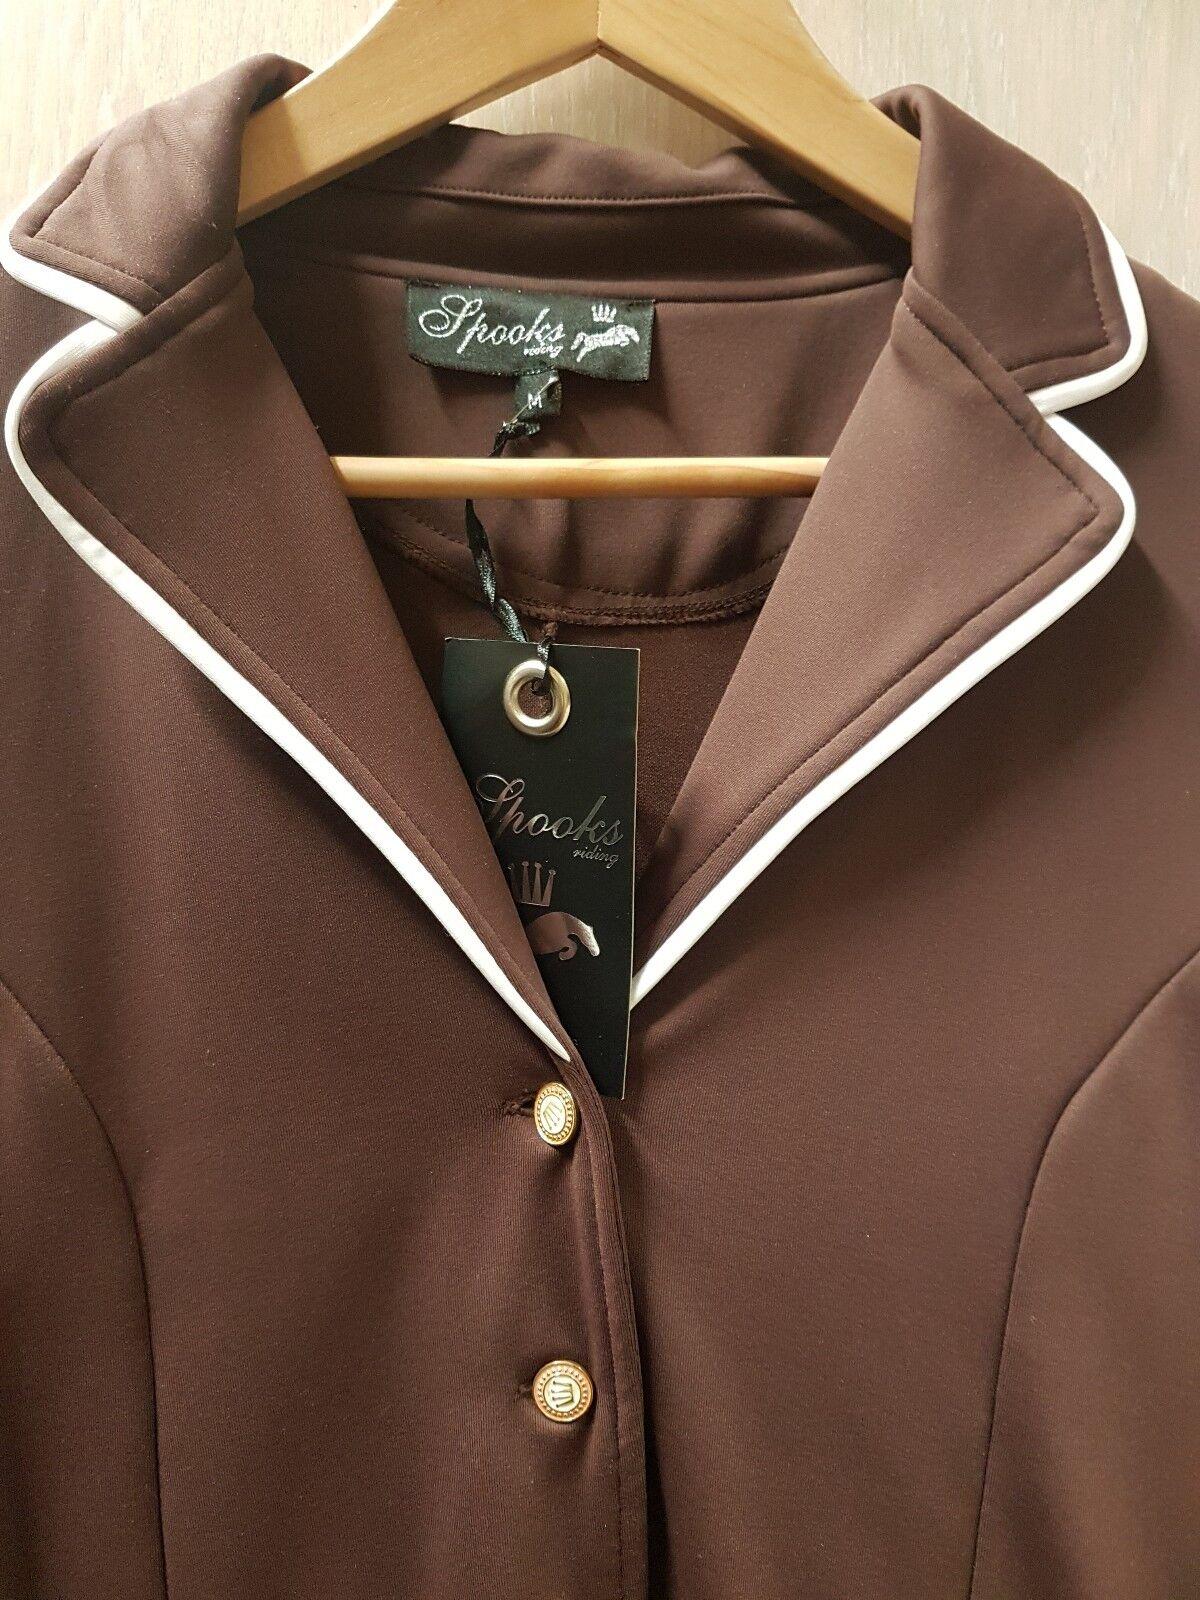 Despectivos showjacket m marrón marrón torneo chaqueta de tu chaqueta turnierjacket marrón torneo